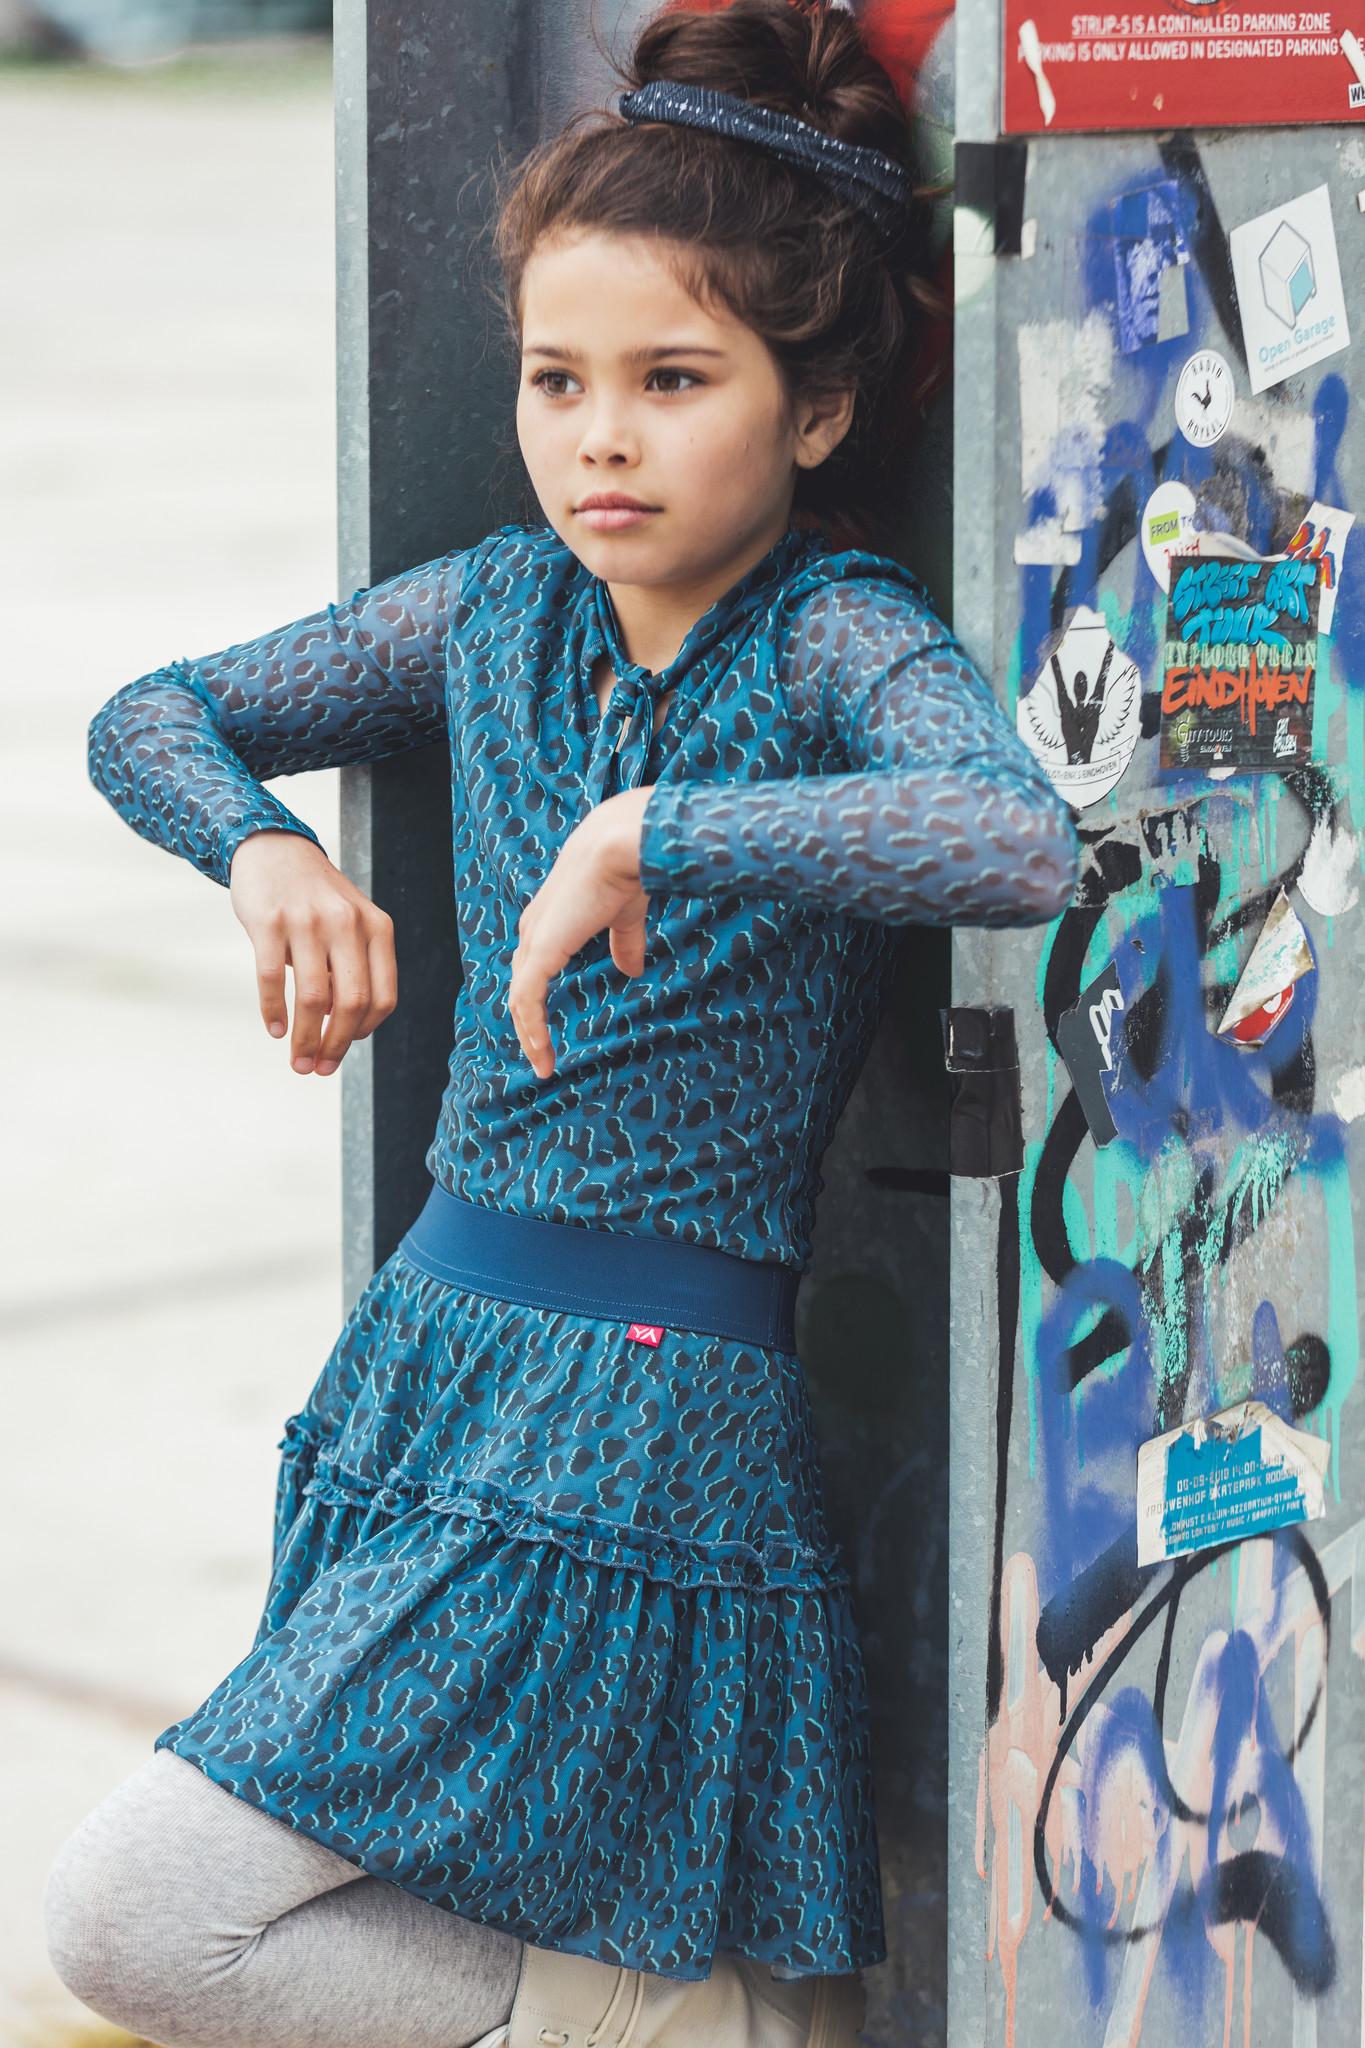 Mayce Girlslabel lookbook winter 2022-55